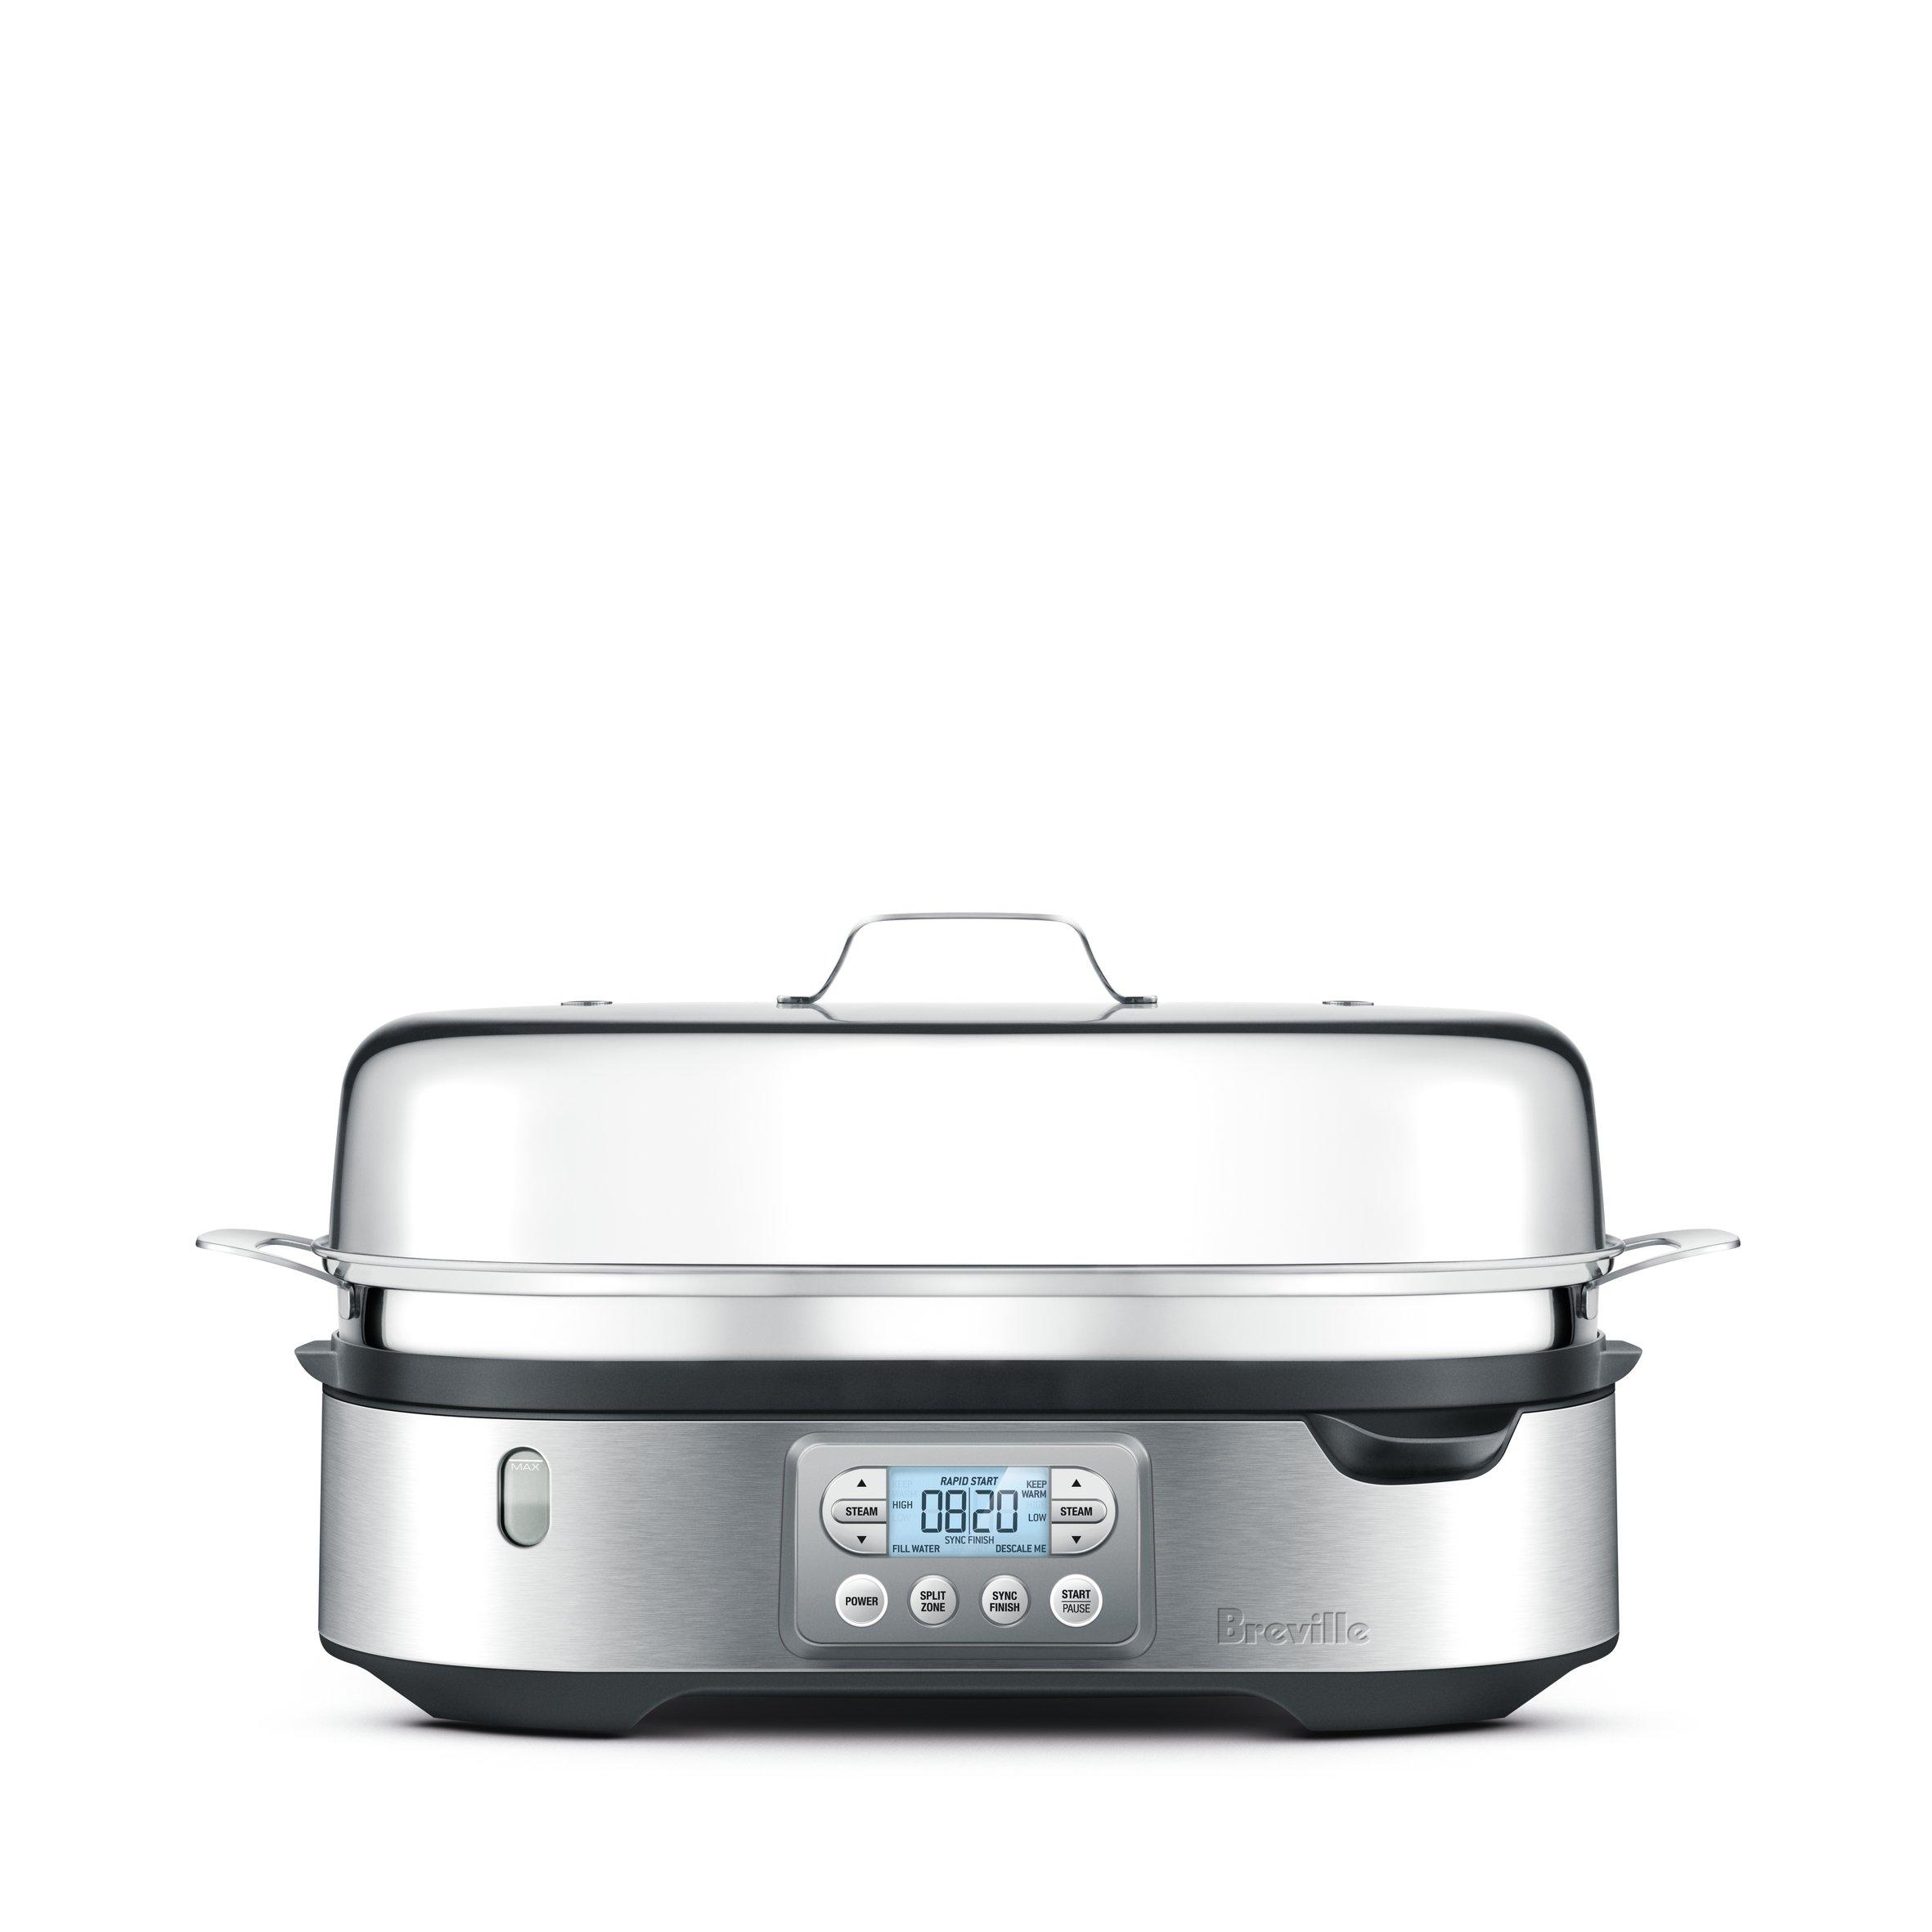 Breville BFS800BSS Food Steamer, Silver